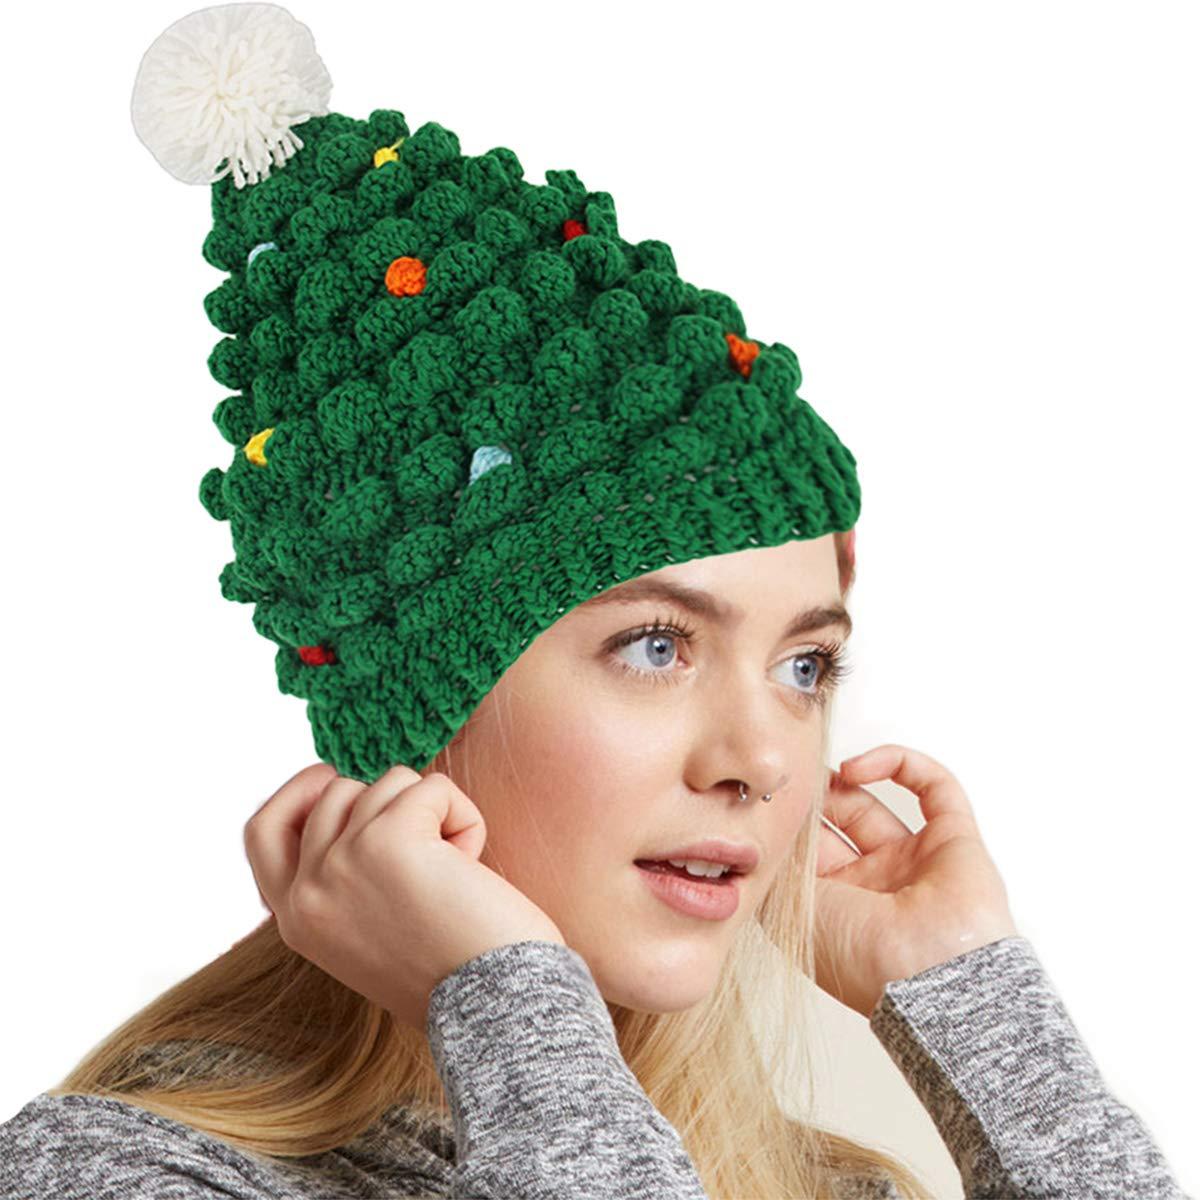 Amazon.com  Green Santa Hat for Adults Christmas Beanie Hats Novelty Winter  Knitted Cotton Crochet Hat G008  Clothing fbda886e1ed